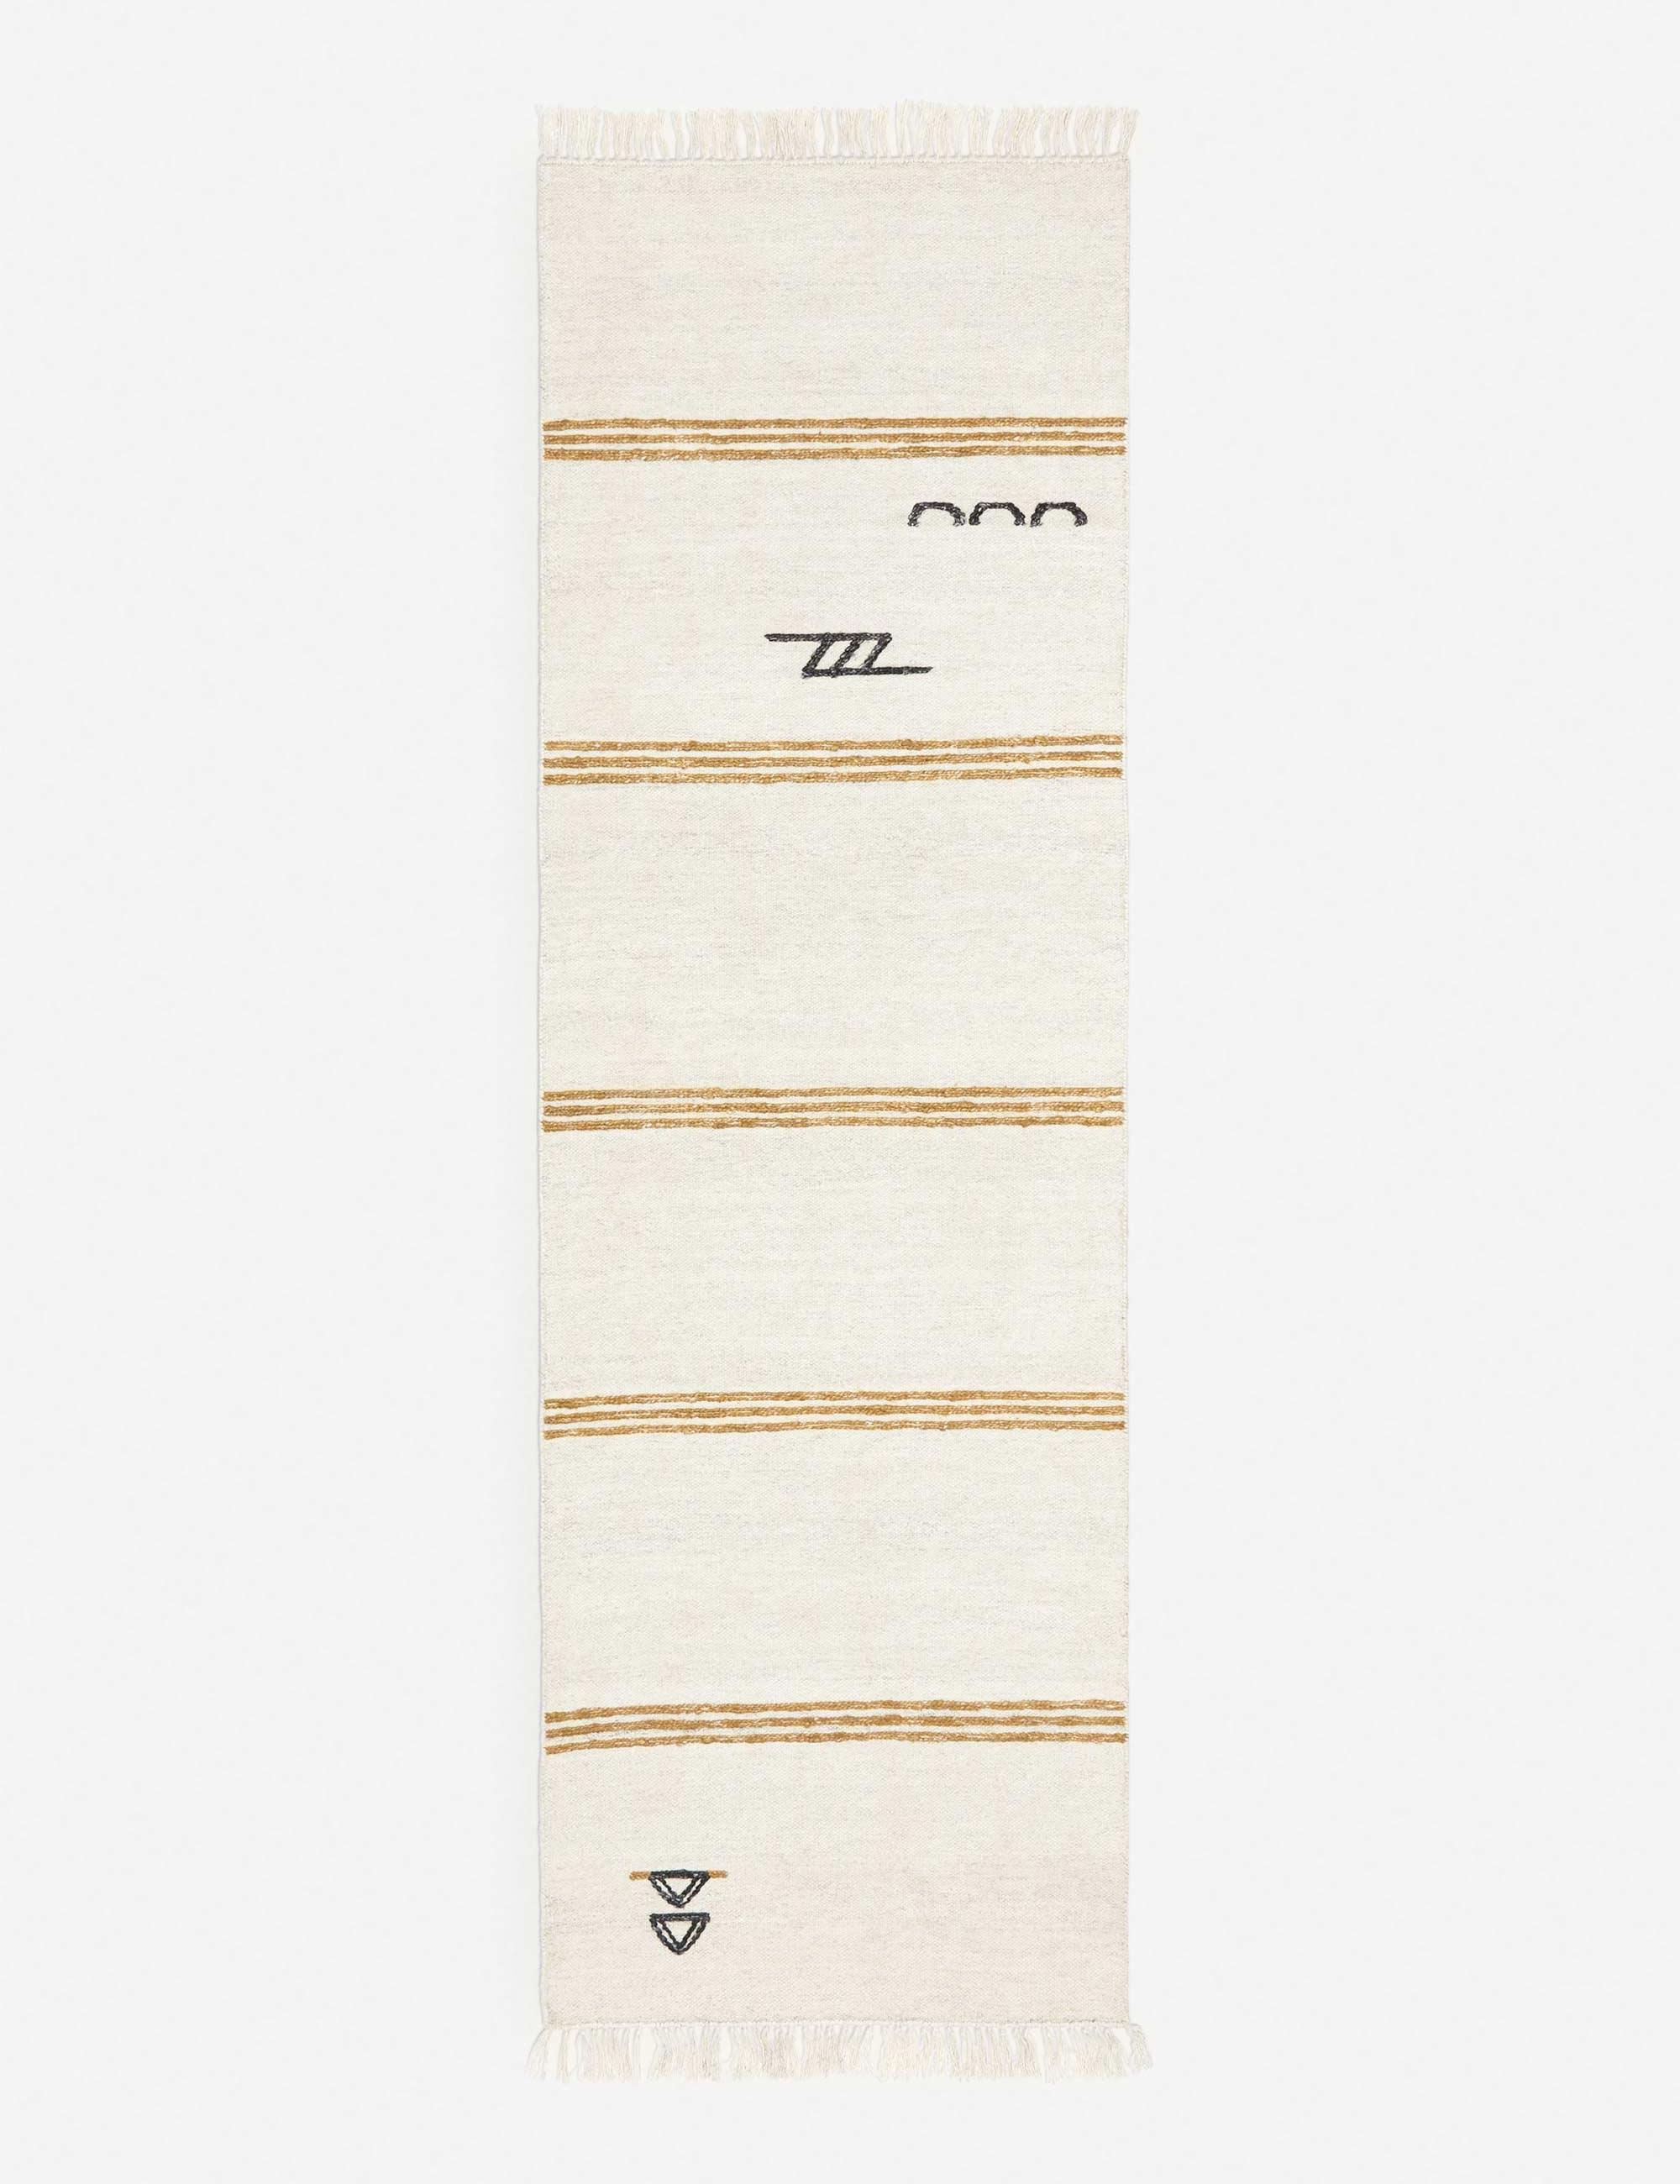 Iconic Stripe Rug By Sarah Sherman Samuel 8' x 10'